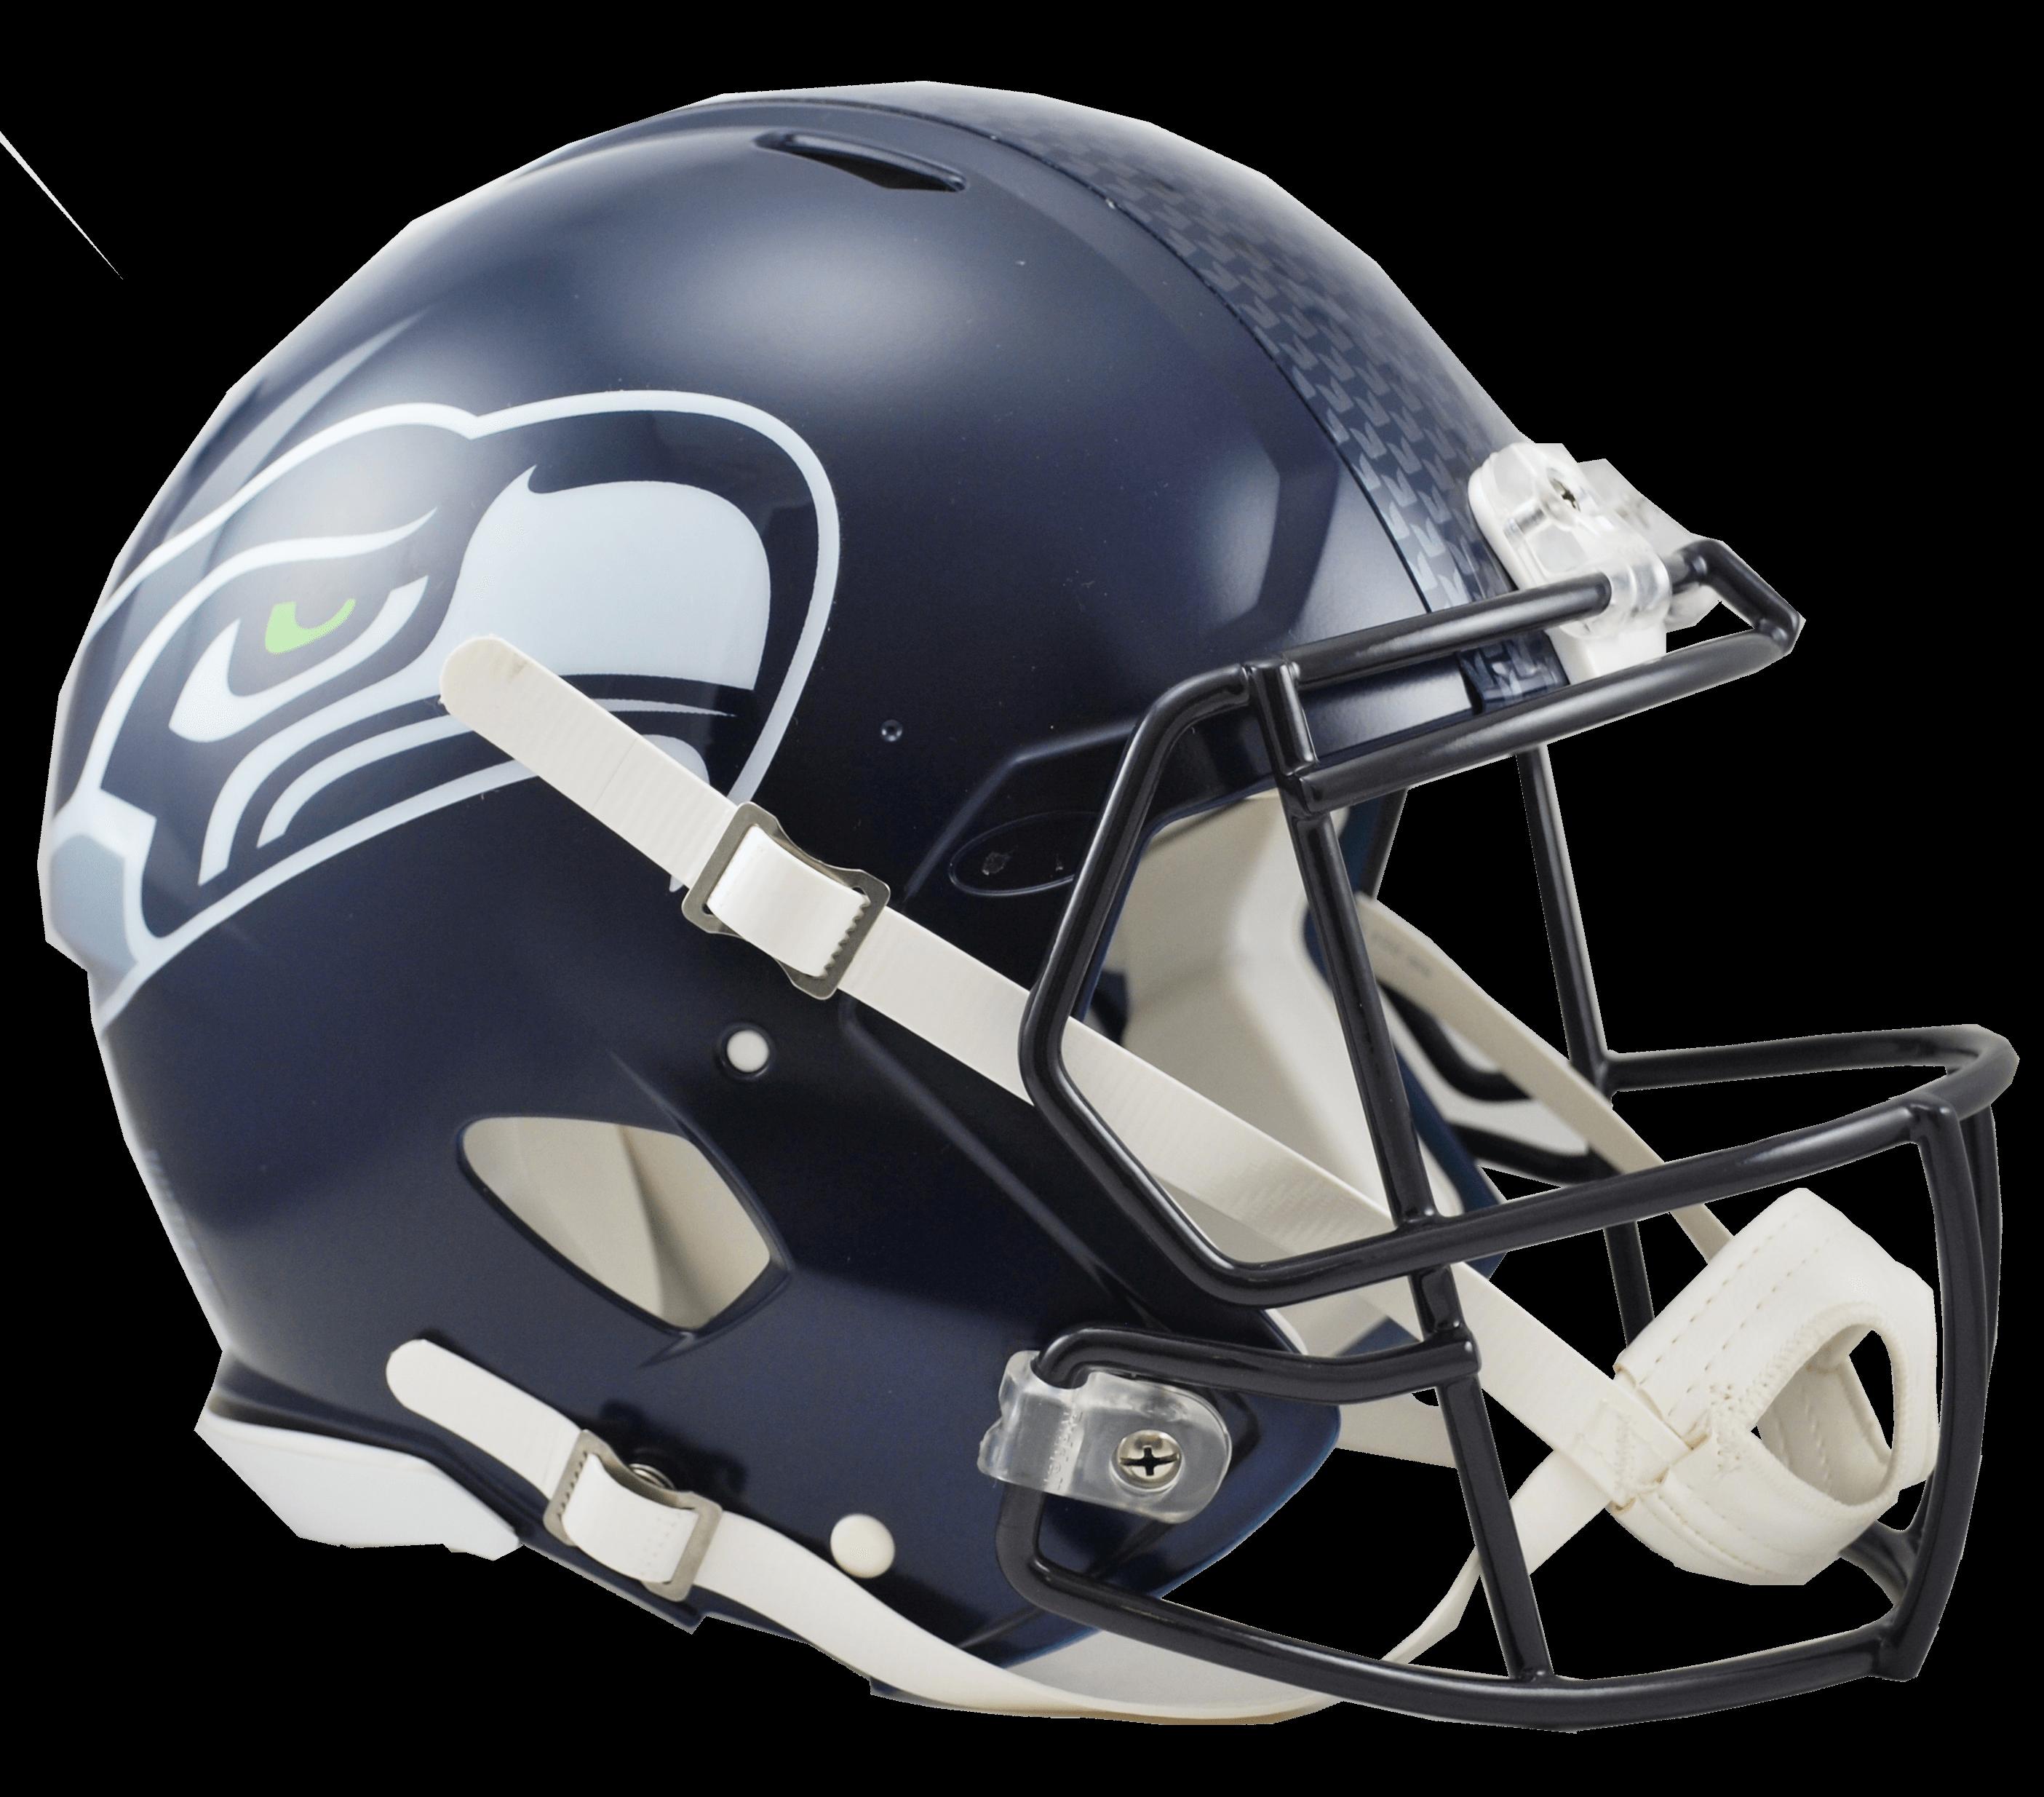 Seattle transparent stickpng download. Seahawks helmet png